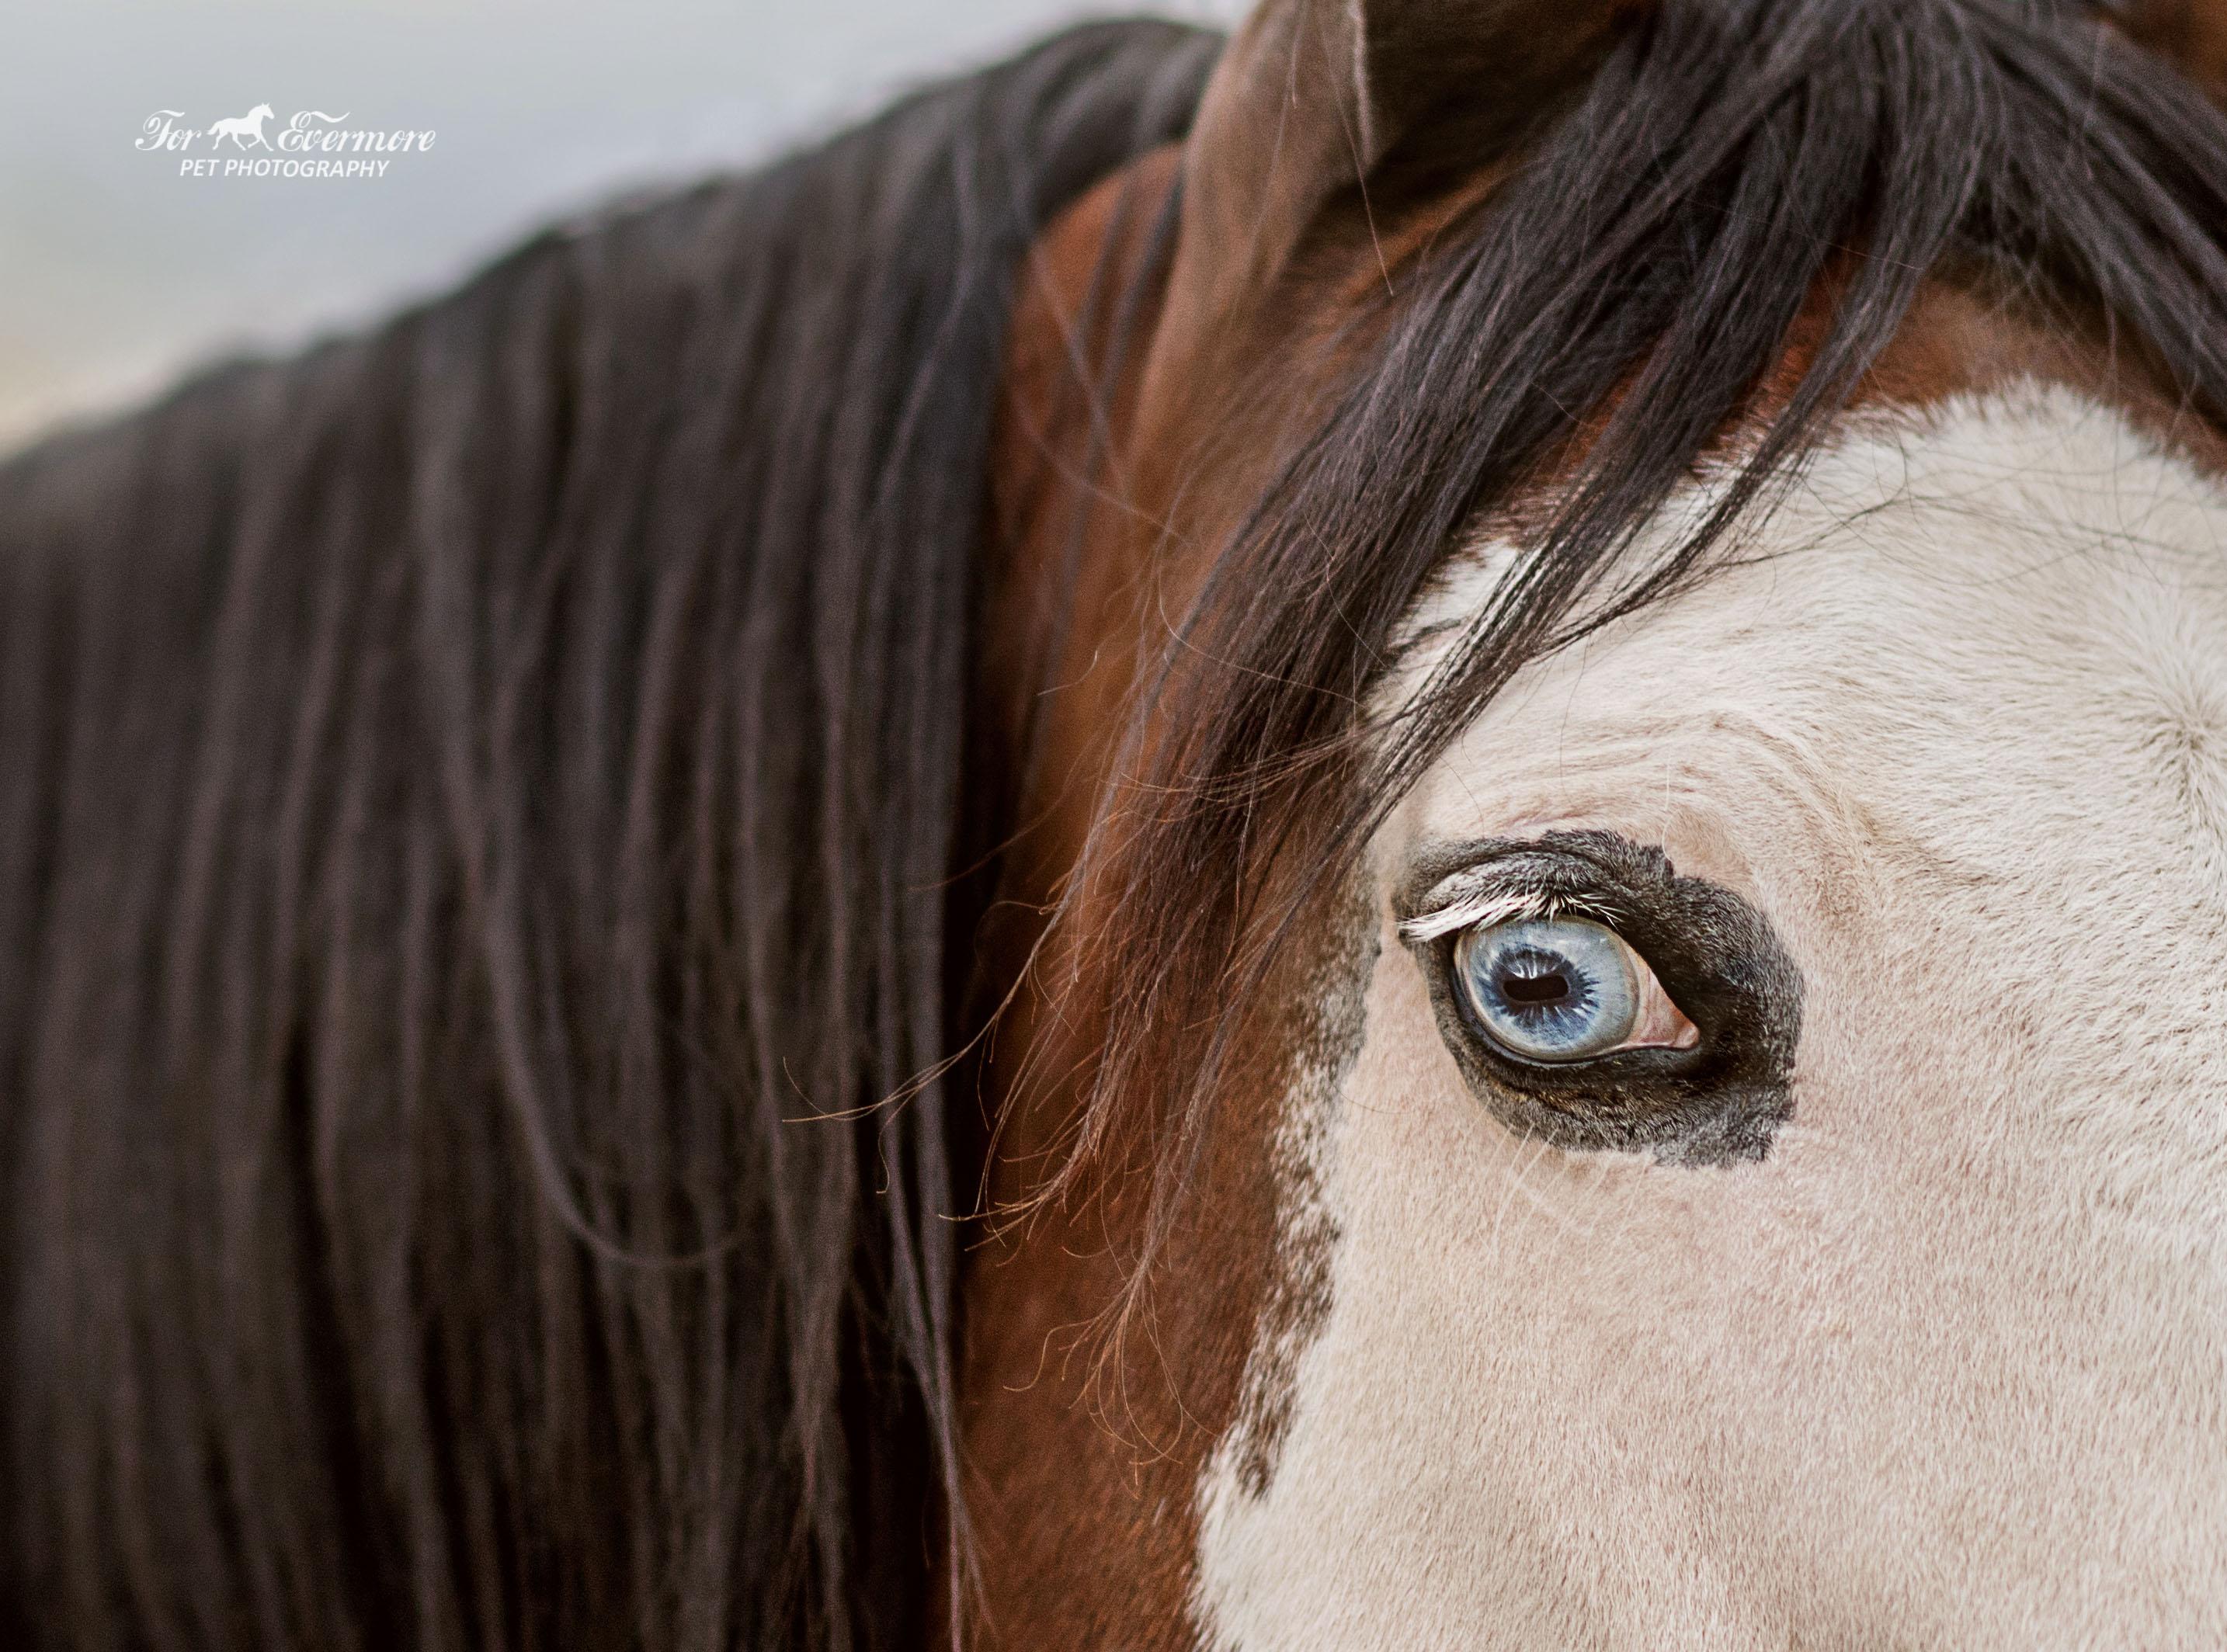 Frankie's stunning blue eye